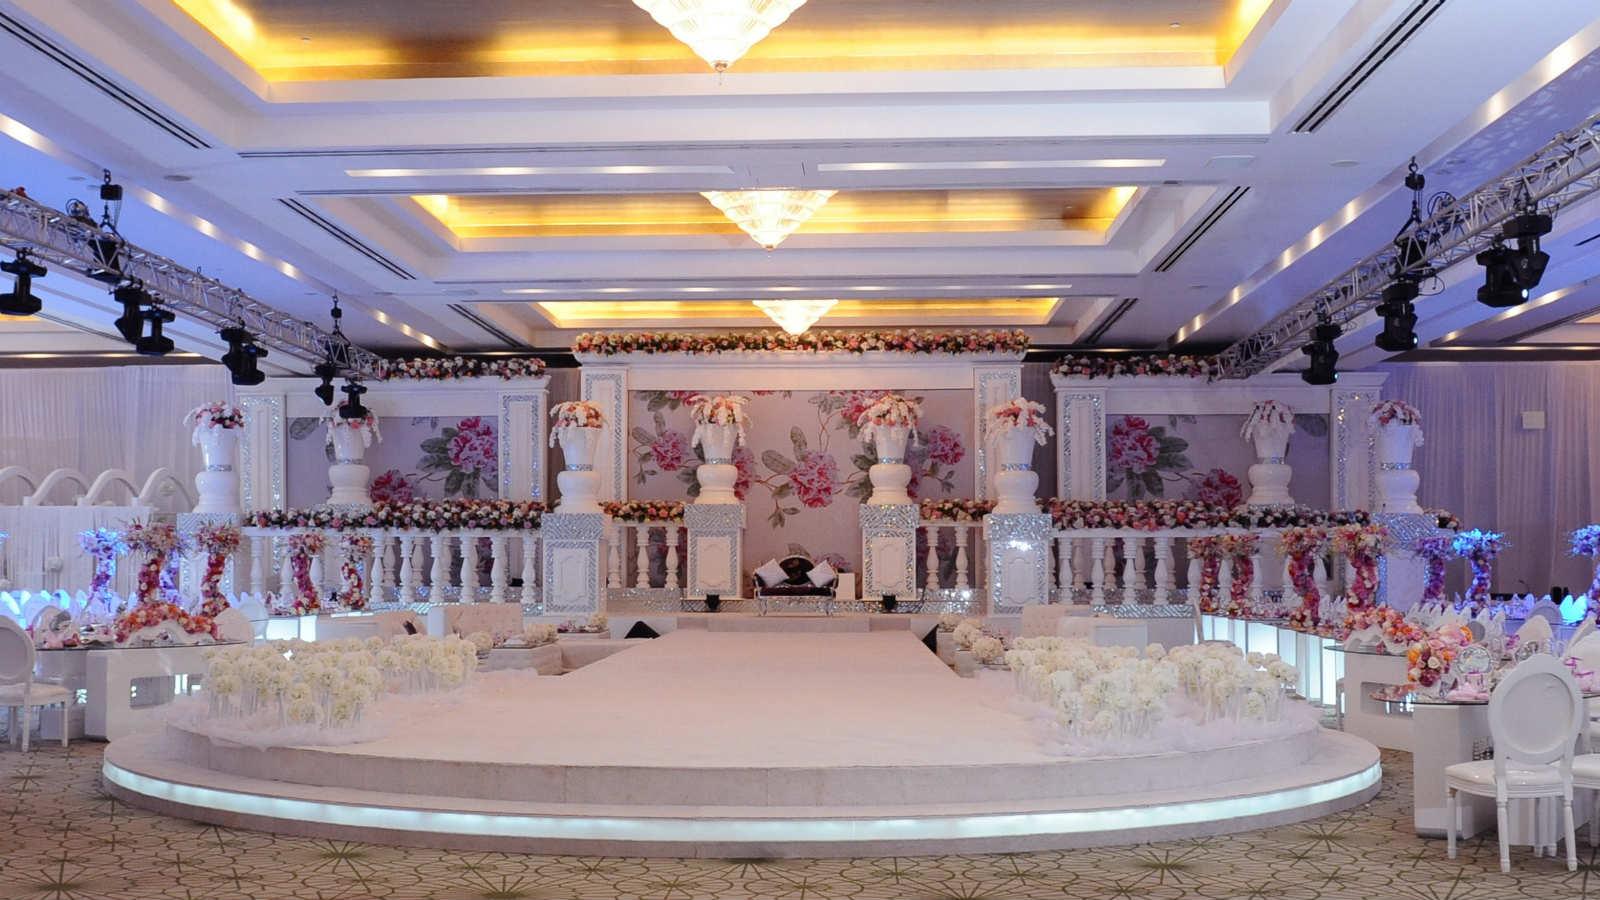 Top 6 Hotels With Wedding Venues In Qatar Arabia Weddings